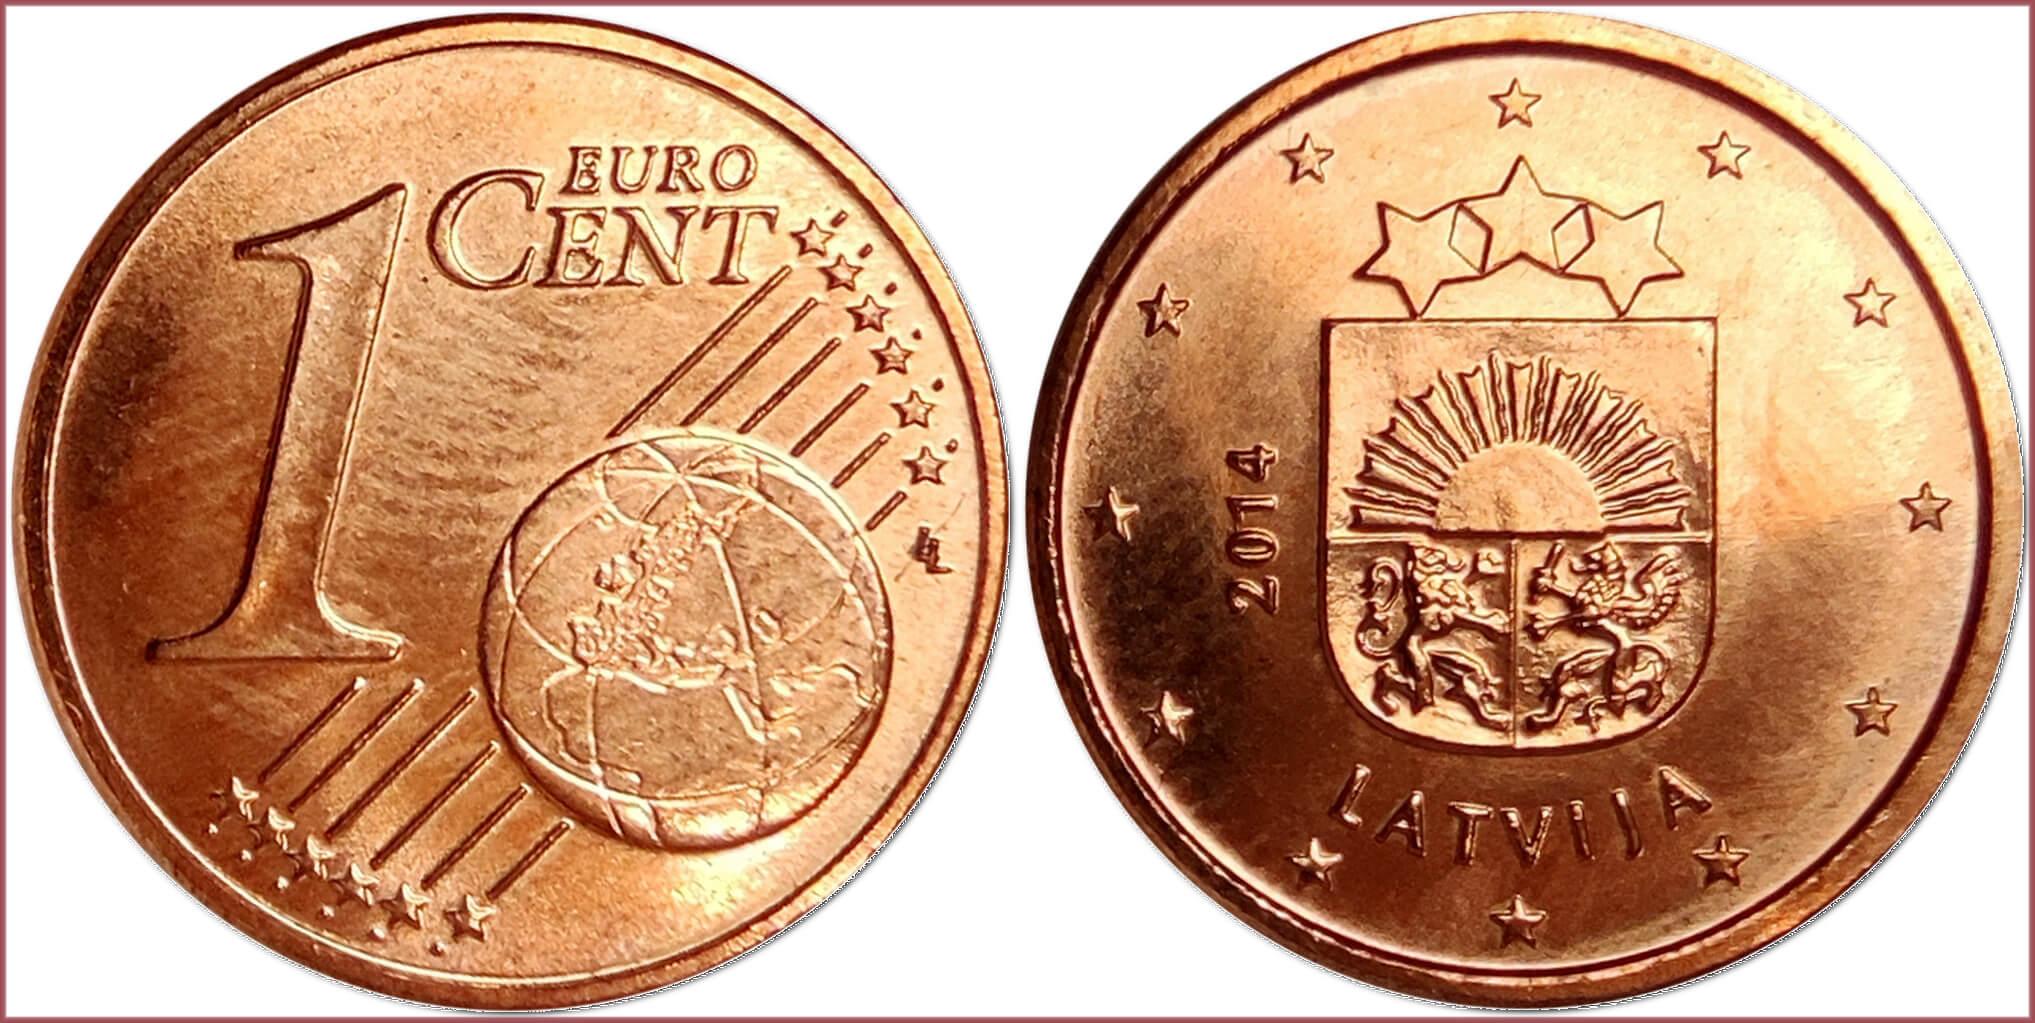 1 euro cent, 2014: Republic of Latvia (European Union)